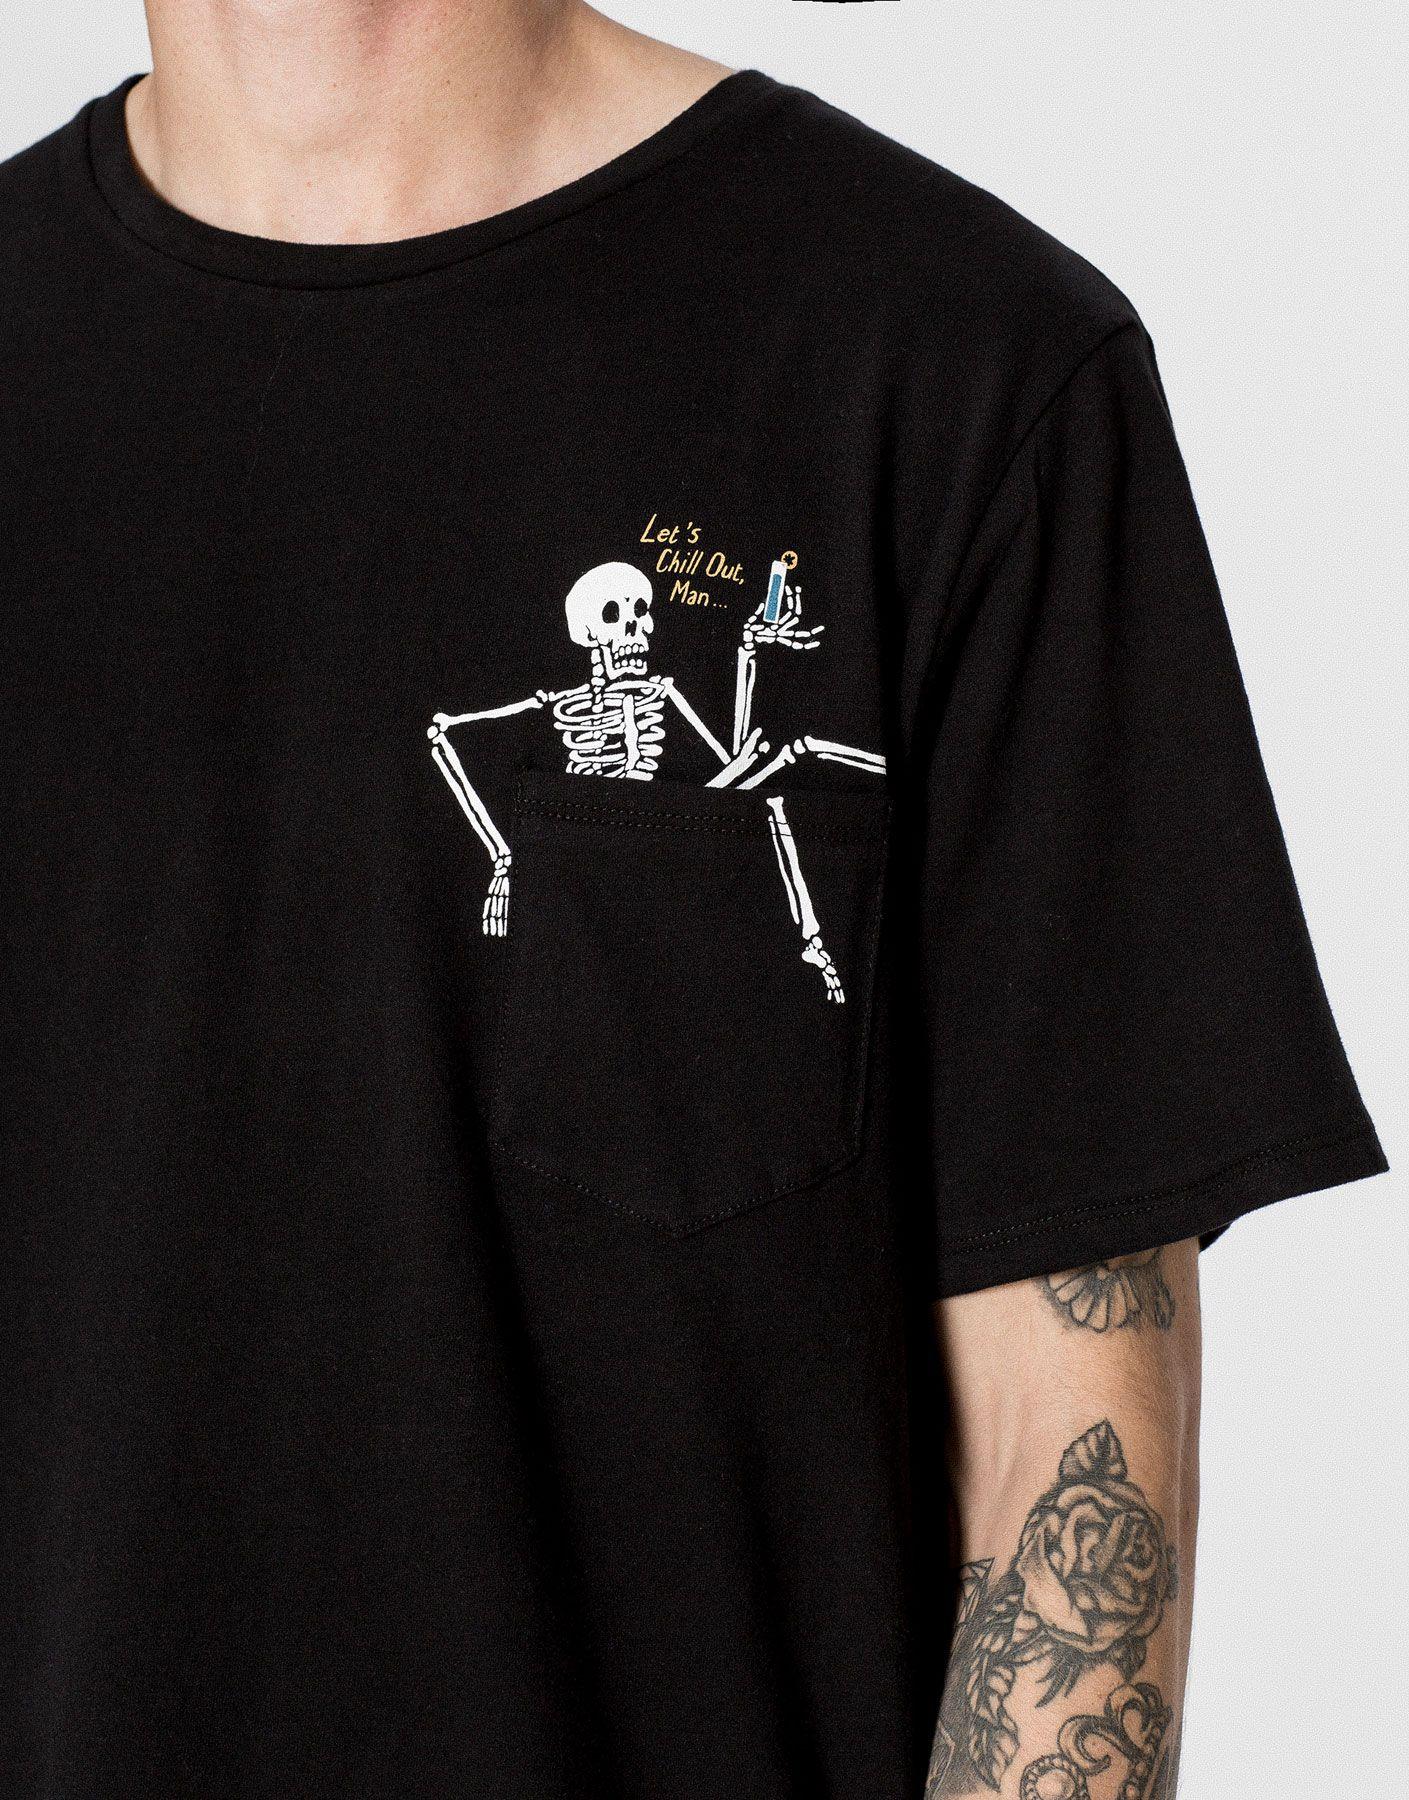 Camiseta print bolsillo esqueleto - Camisetas - Ropa - Hombre - PULL BEAR  México eb47ef50343